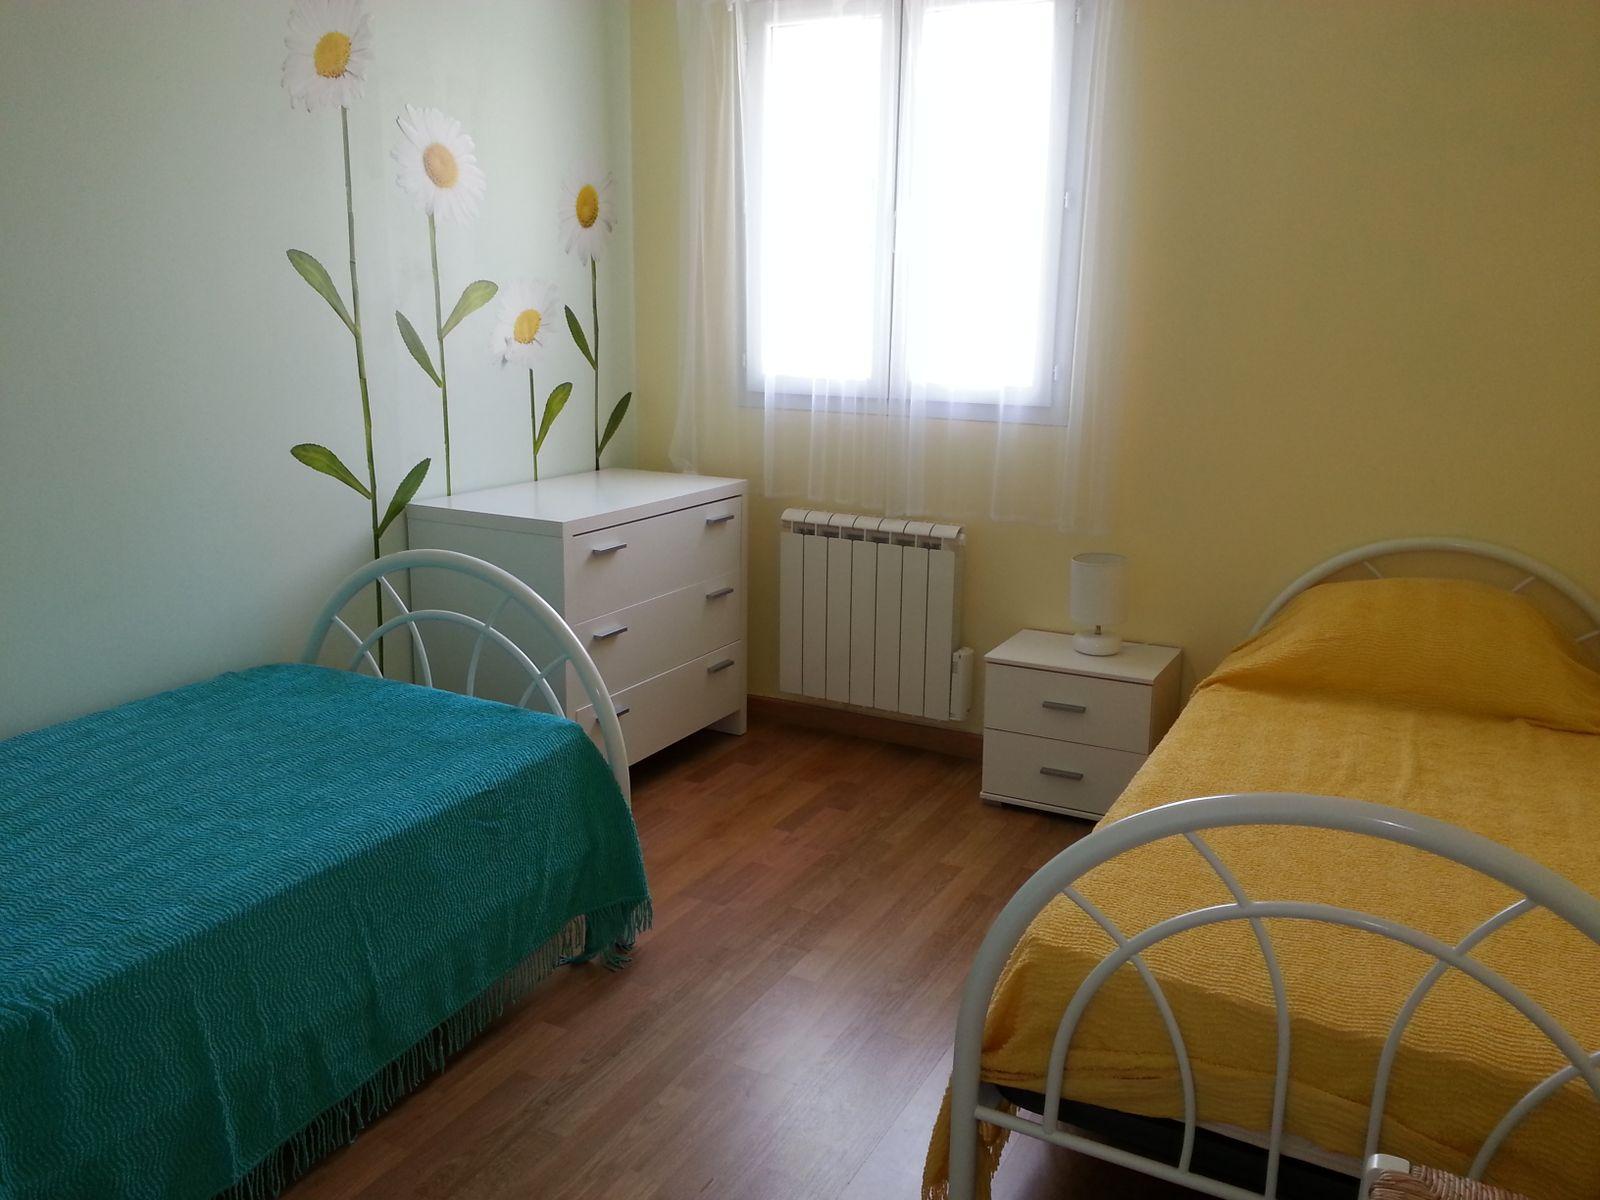 Chambre jaune et vert